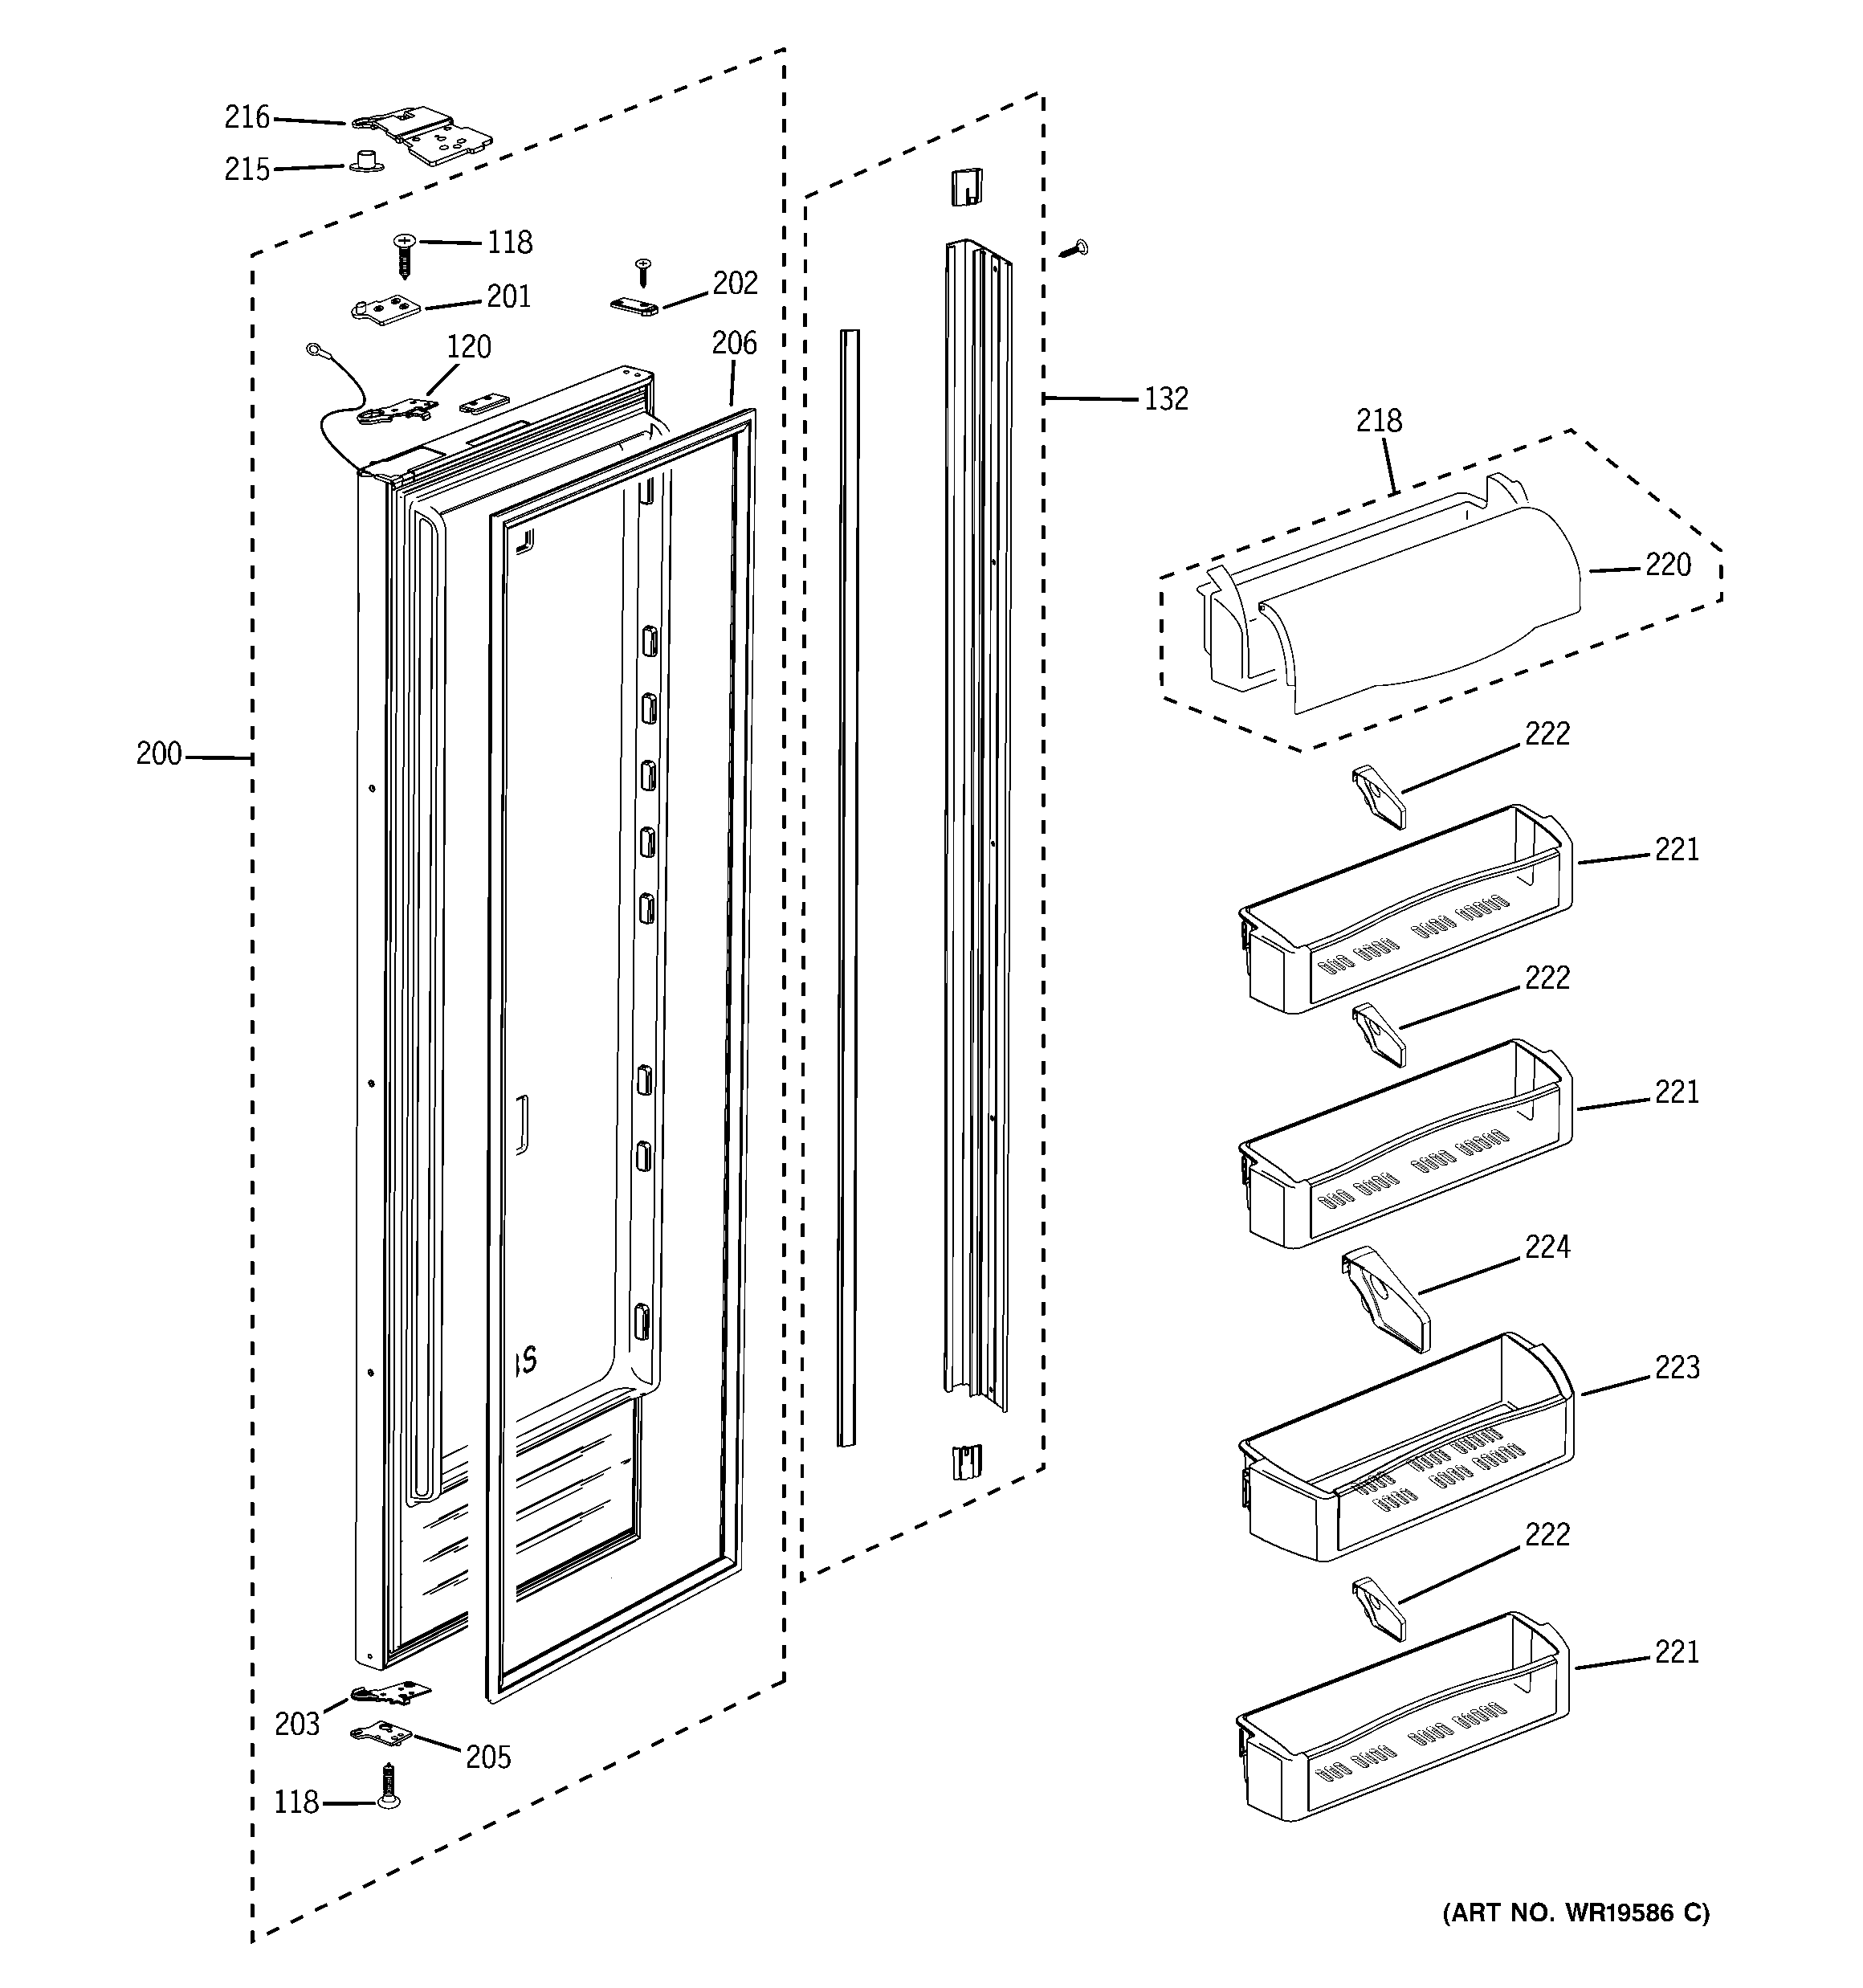 Wiring Diagram For Ge Model Psb42lsrbbv